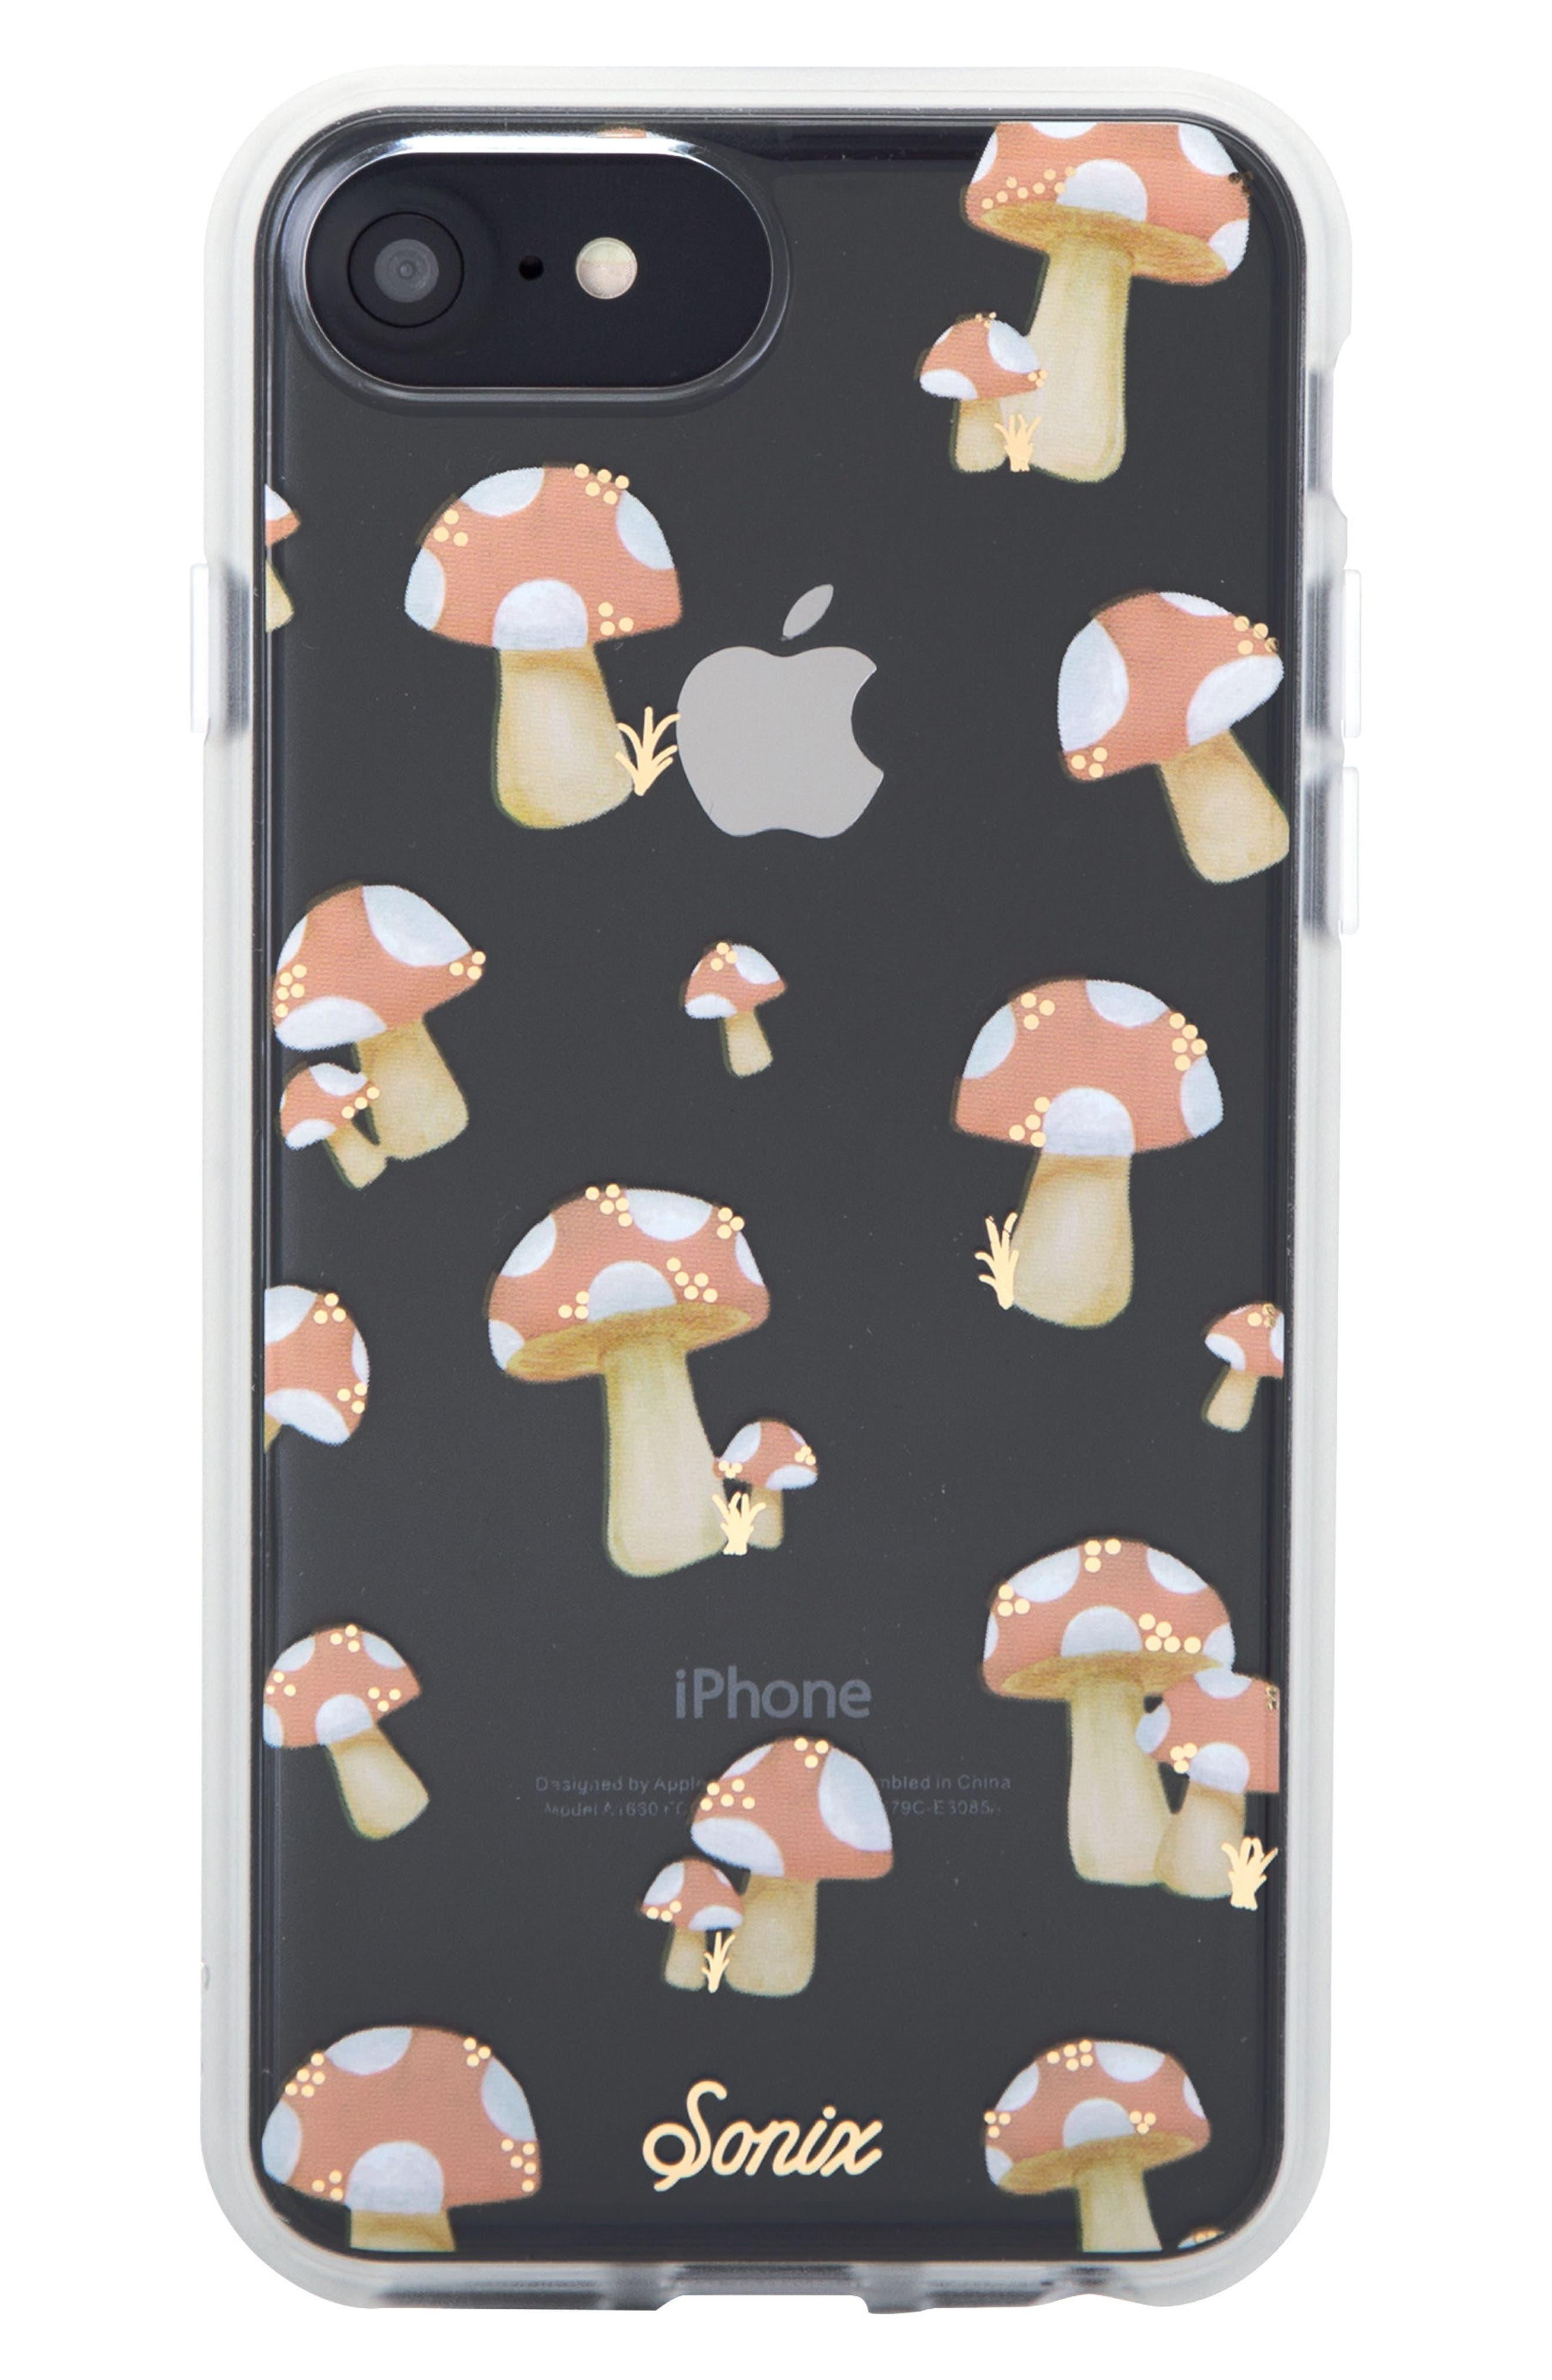 Mushroom iPhone 6/6s/7/8 & 6/6s/7/8 Plus Case,                             Main thumbnail 1, color,                             Peach/ Tan